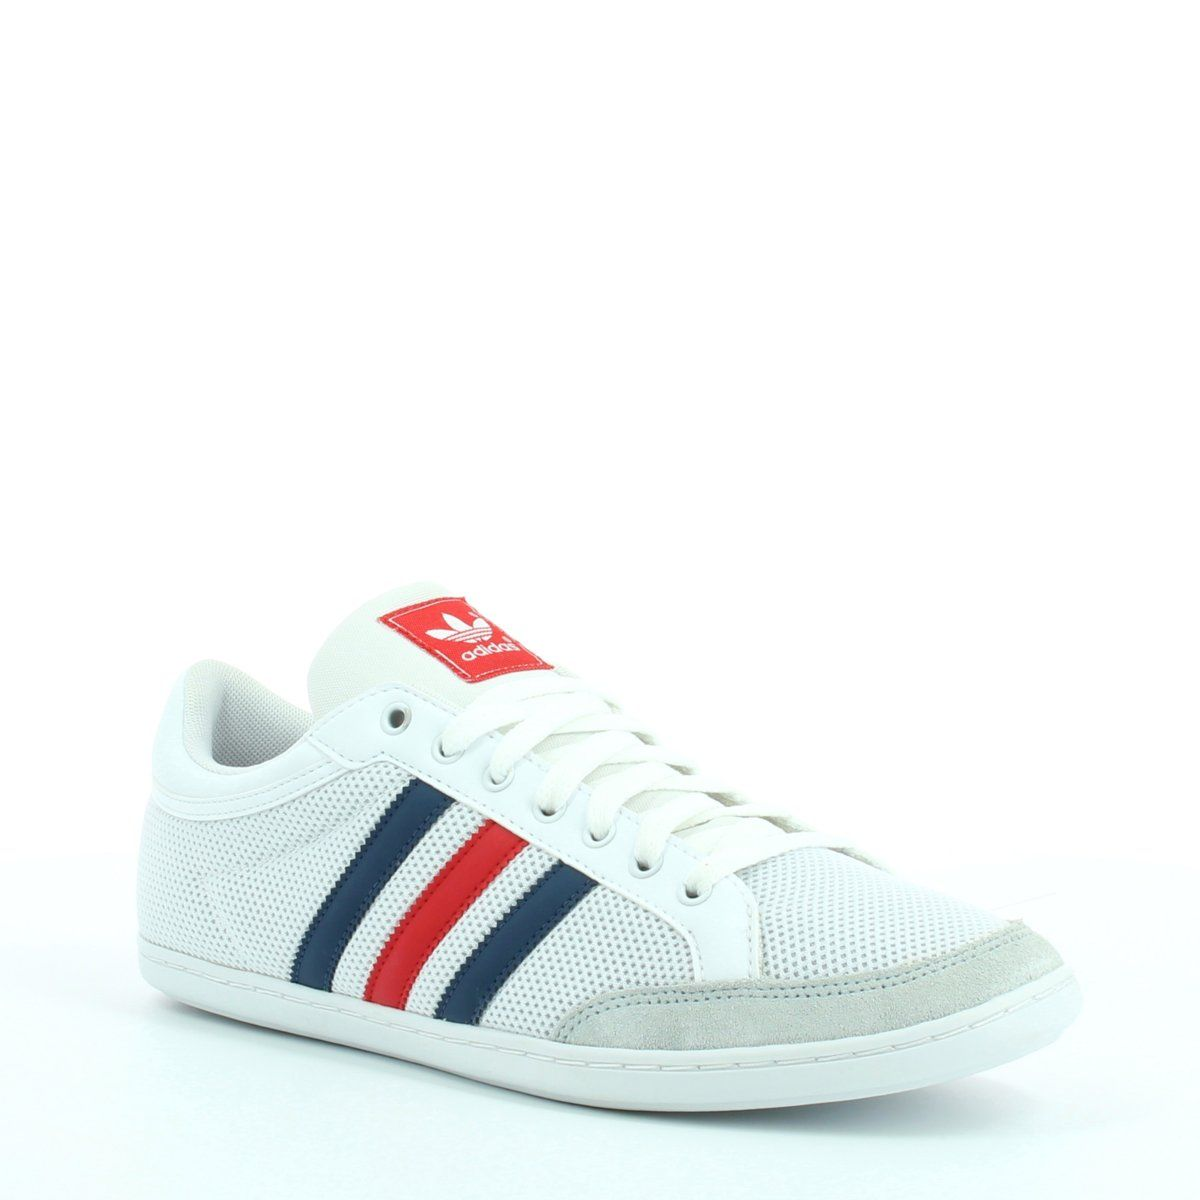 Plimcana Low adidas, Adidas | Chaussure